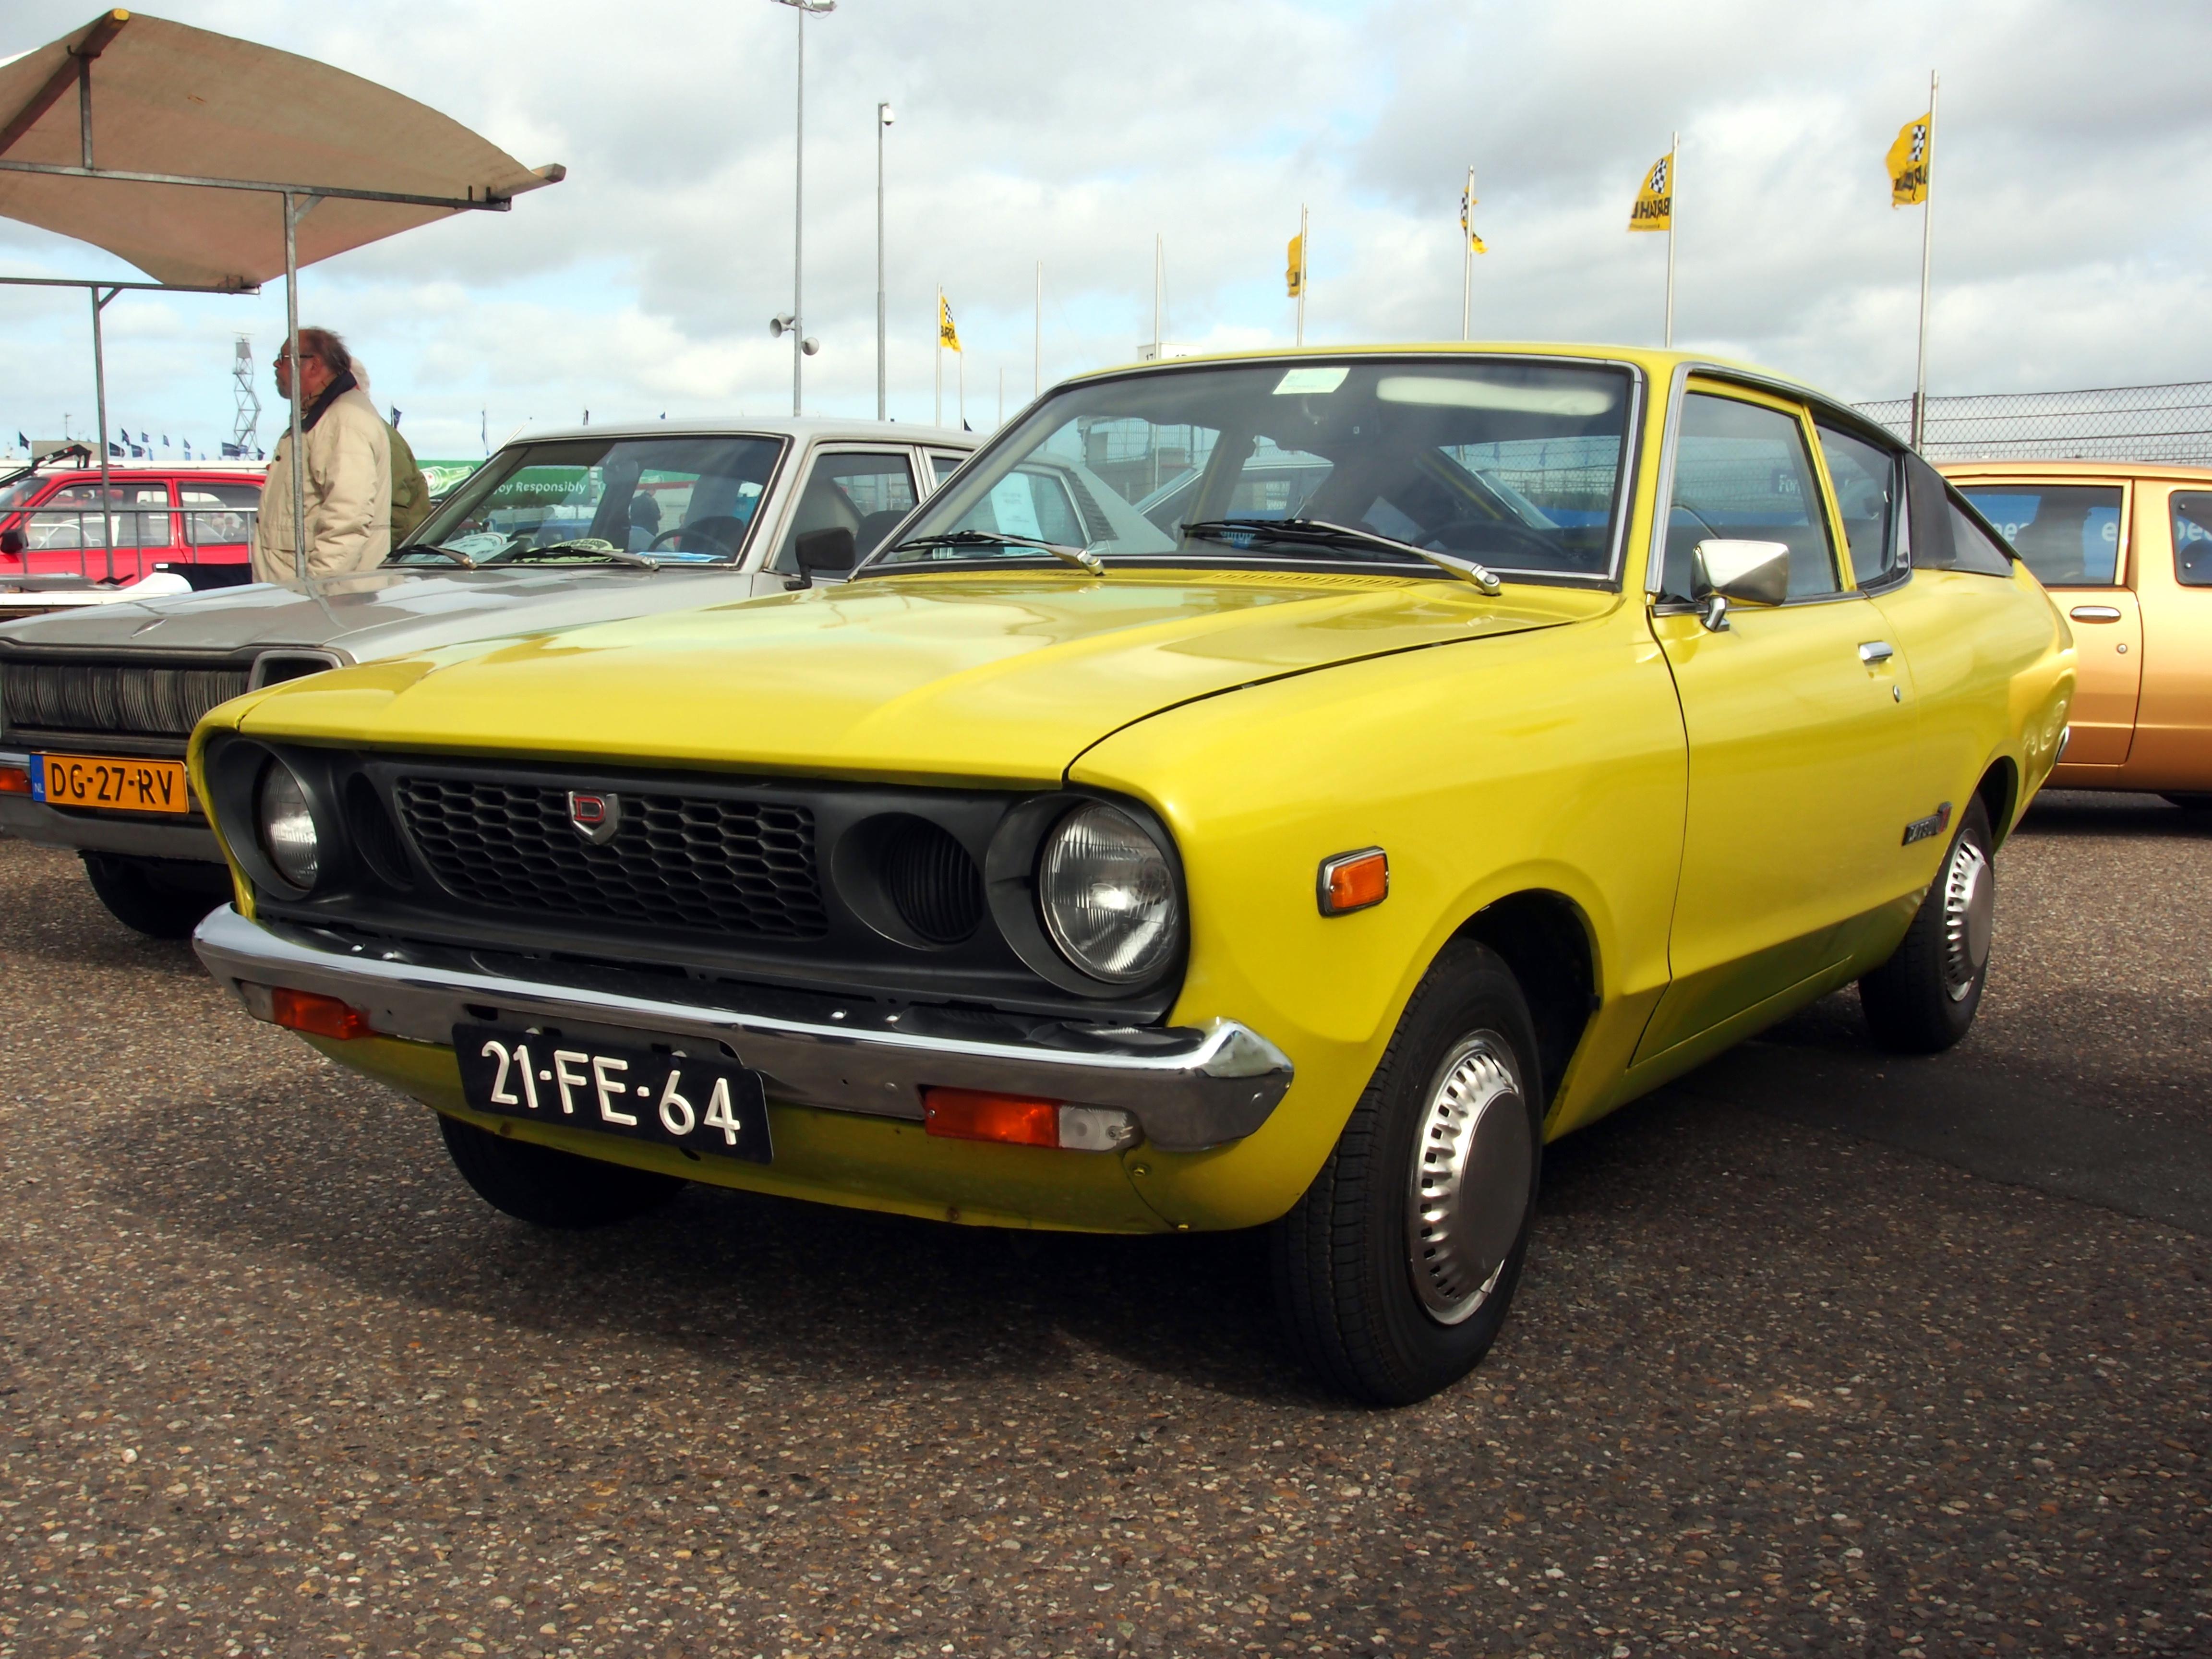 File:1975 Datsun 120 Y pic2.JPG - Wikimedia Commons